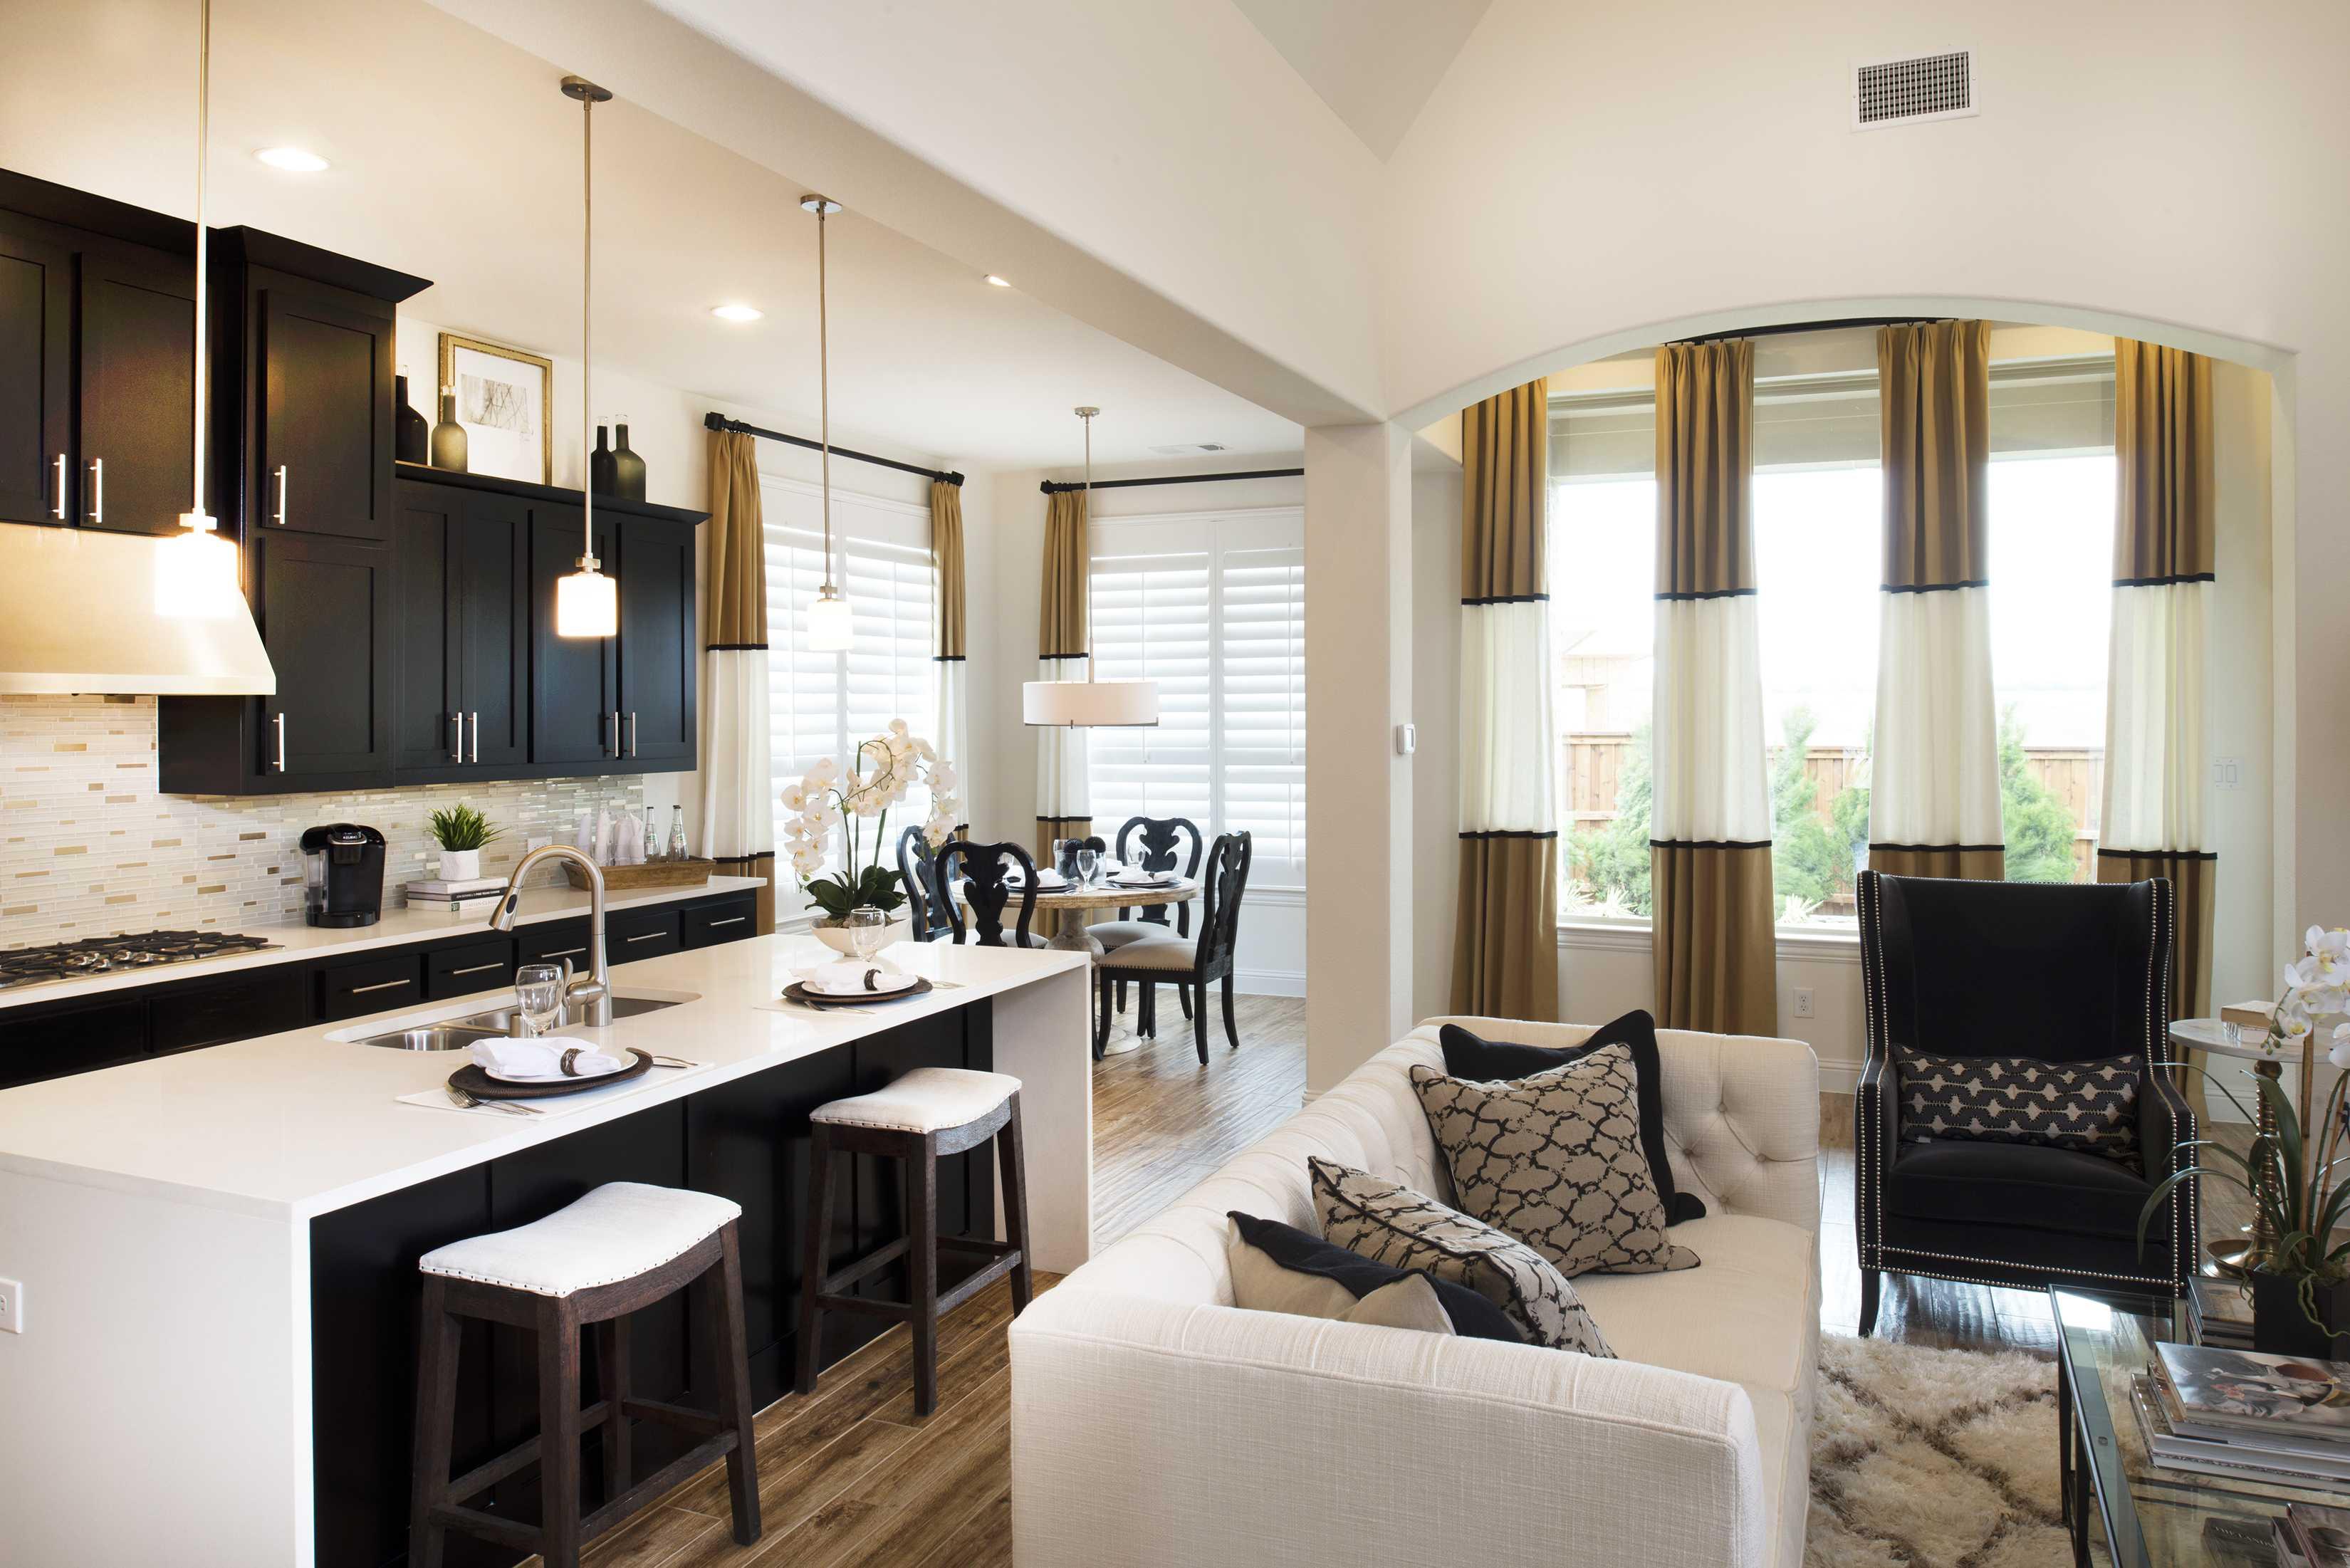 Representative Photo. New Home Plan 599 in Las Colinas  TX 75063